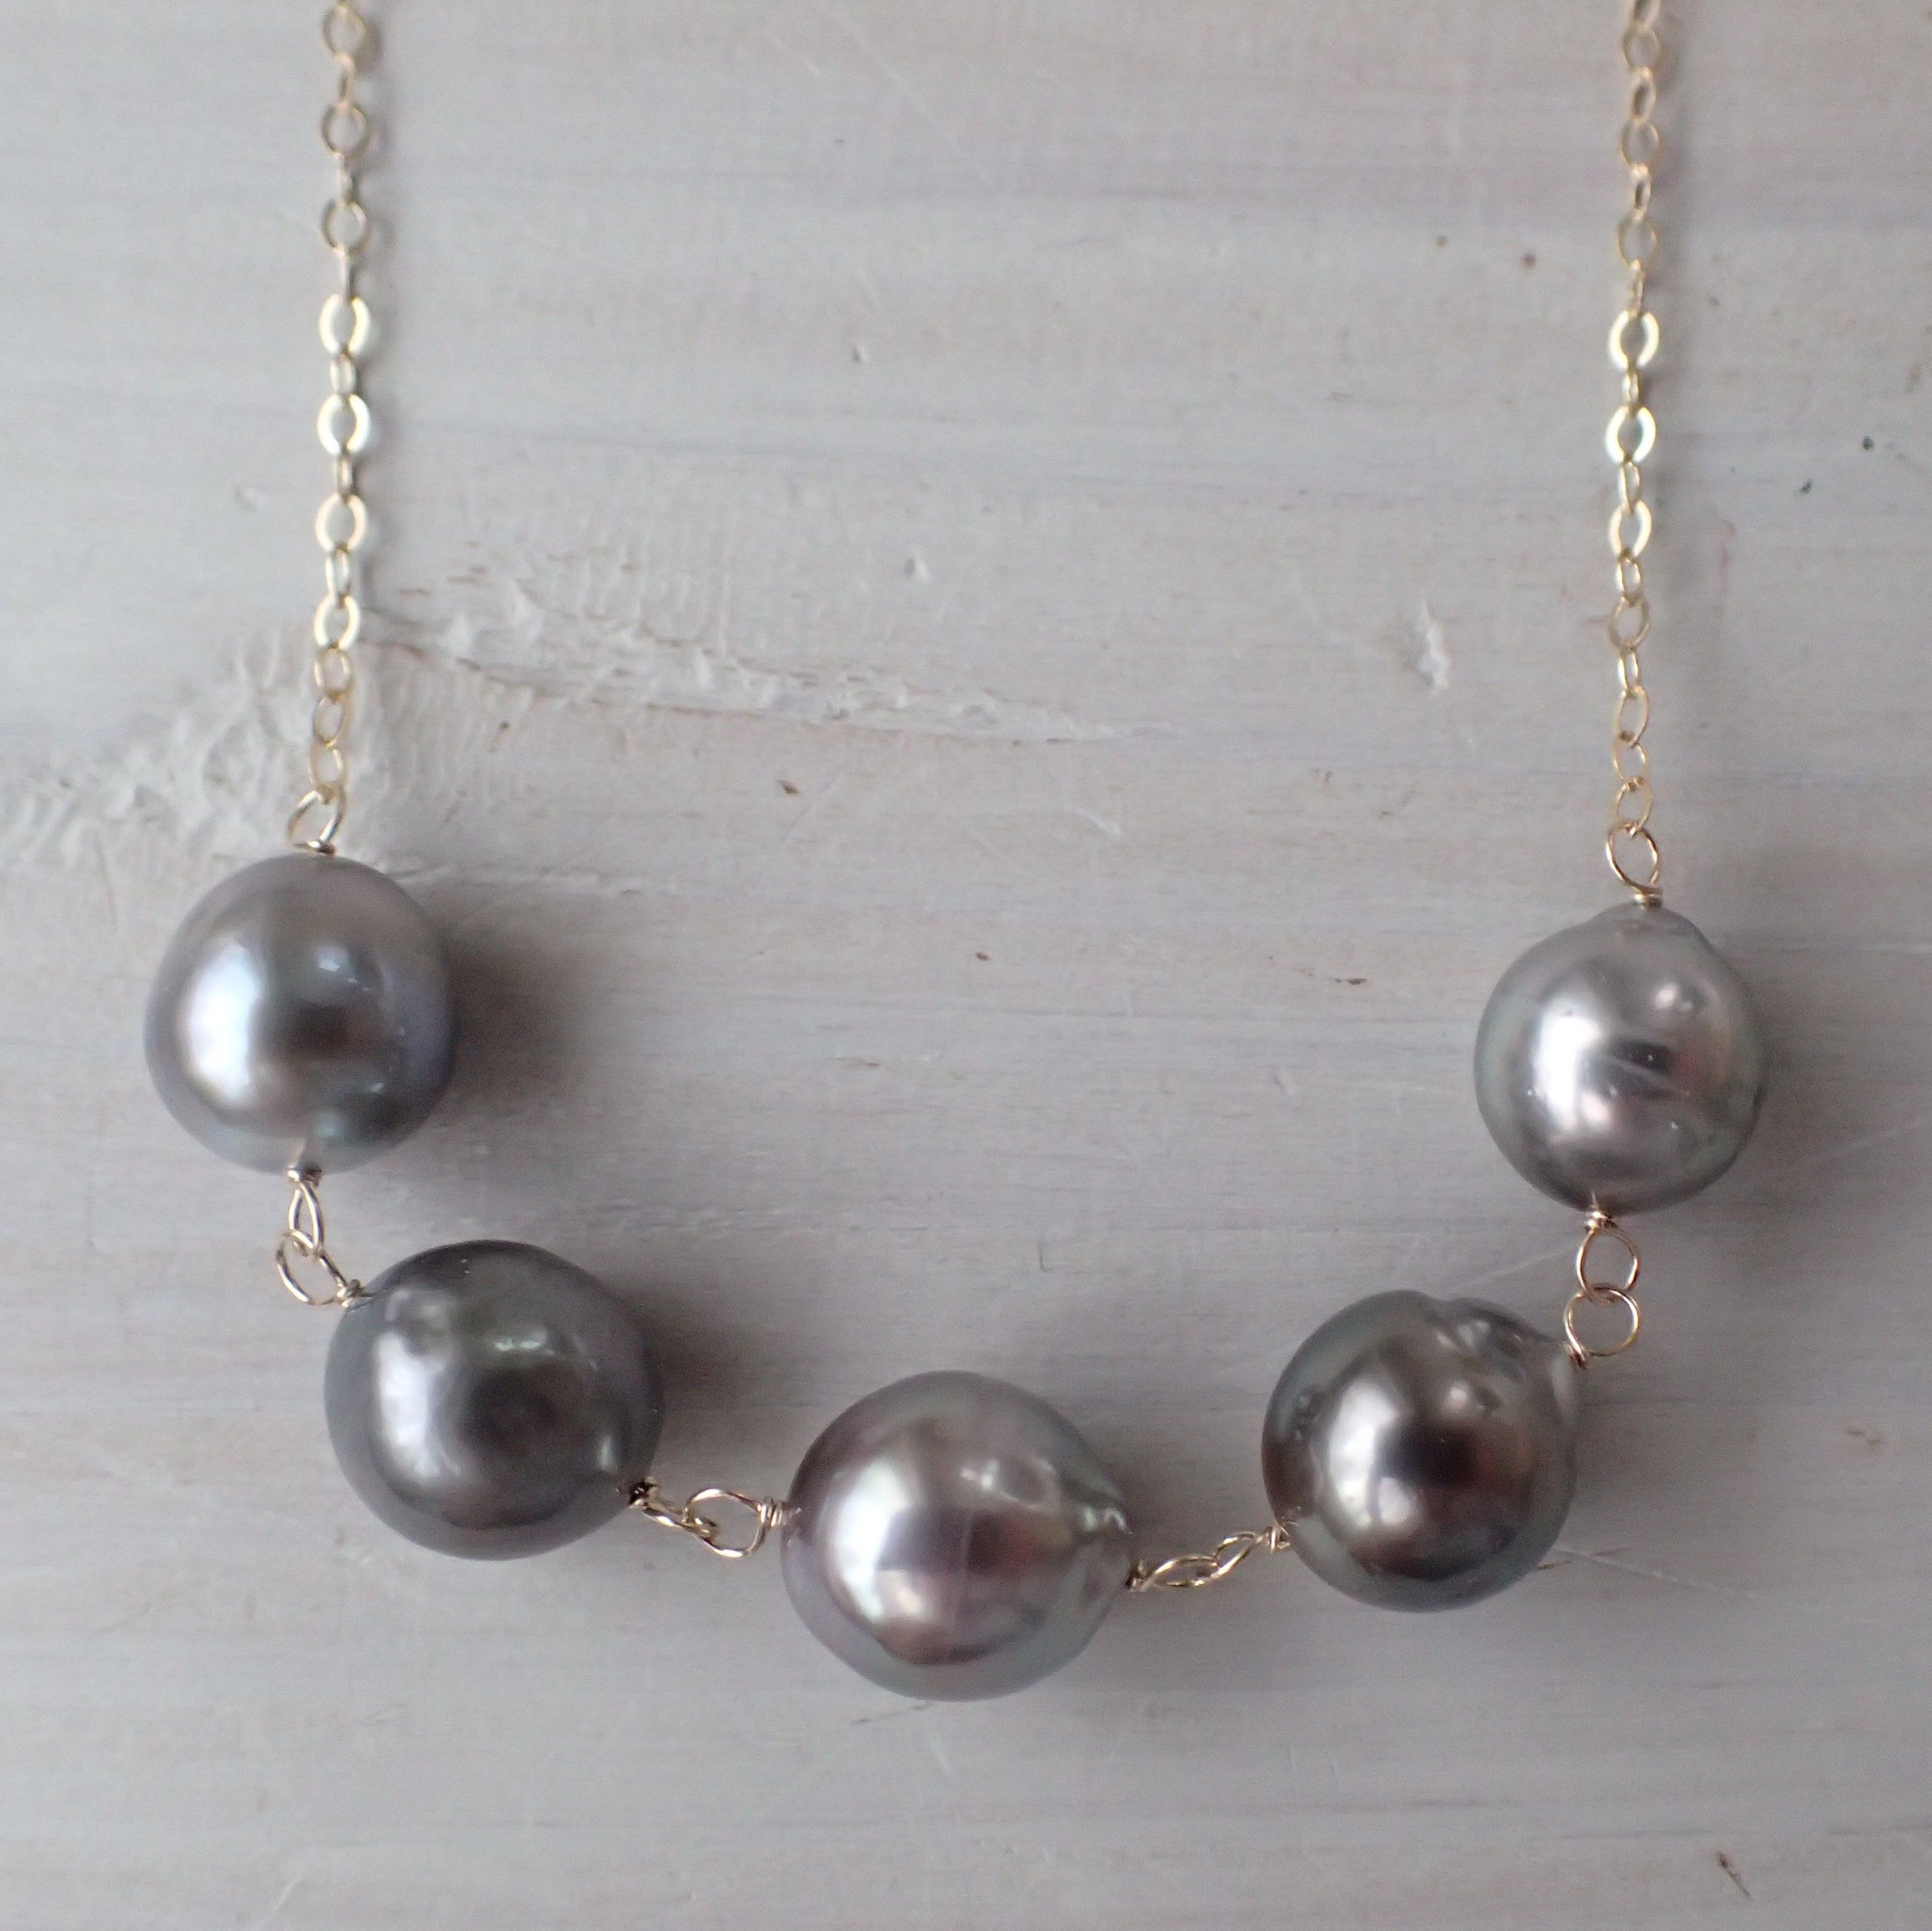 K14GF 5 brown color tahitian pearl necklace